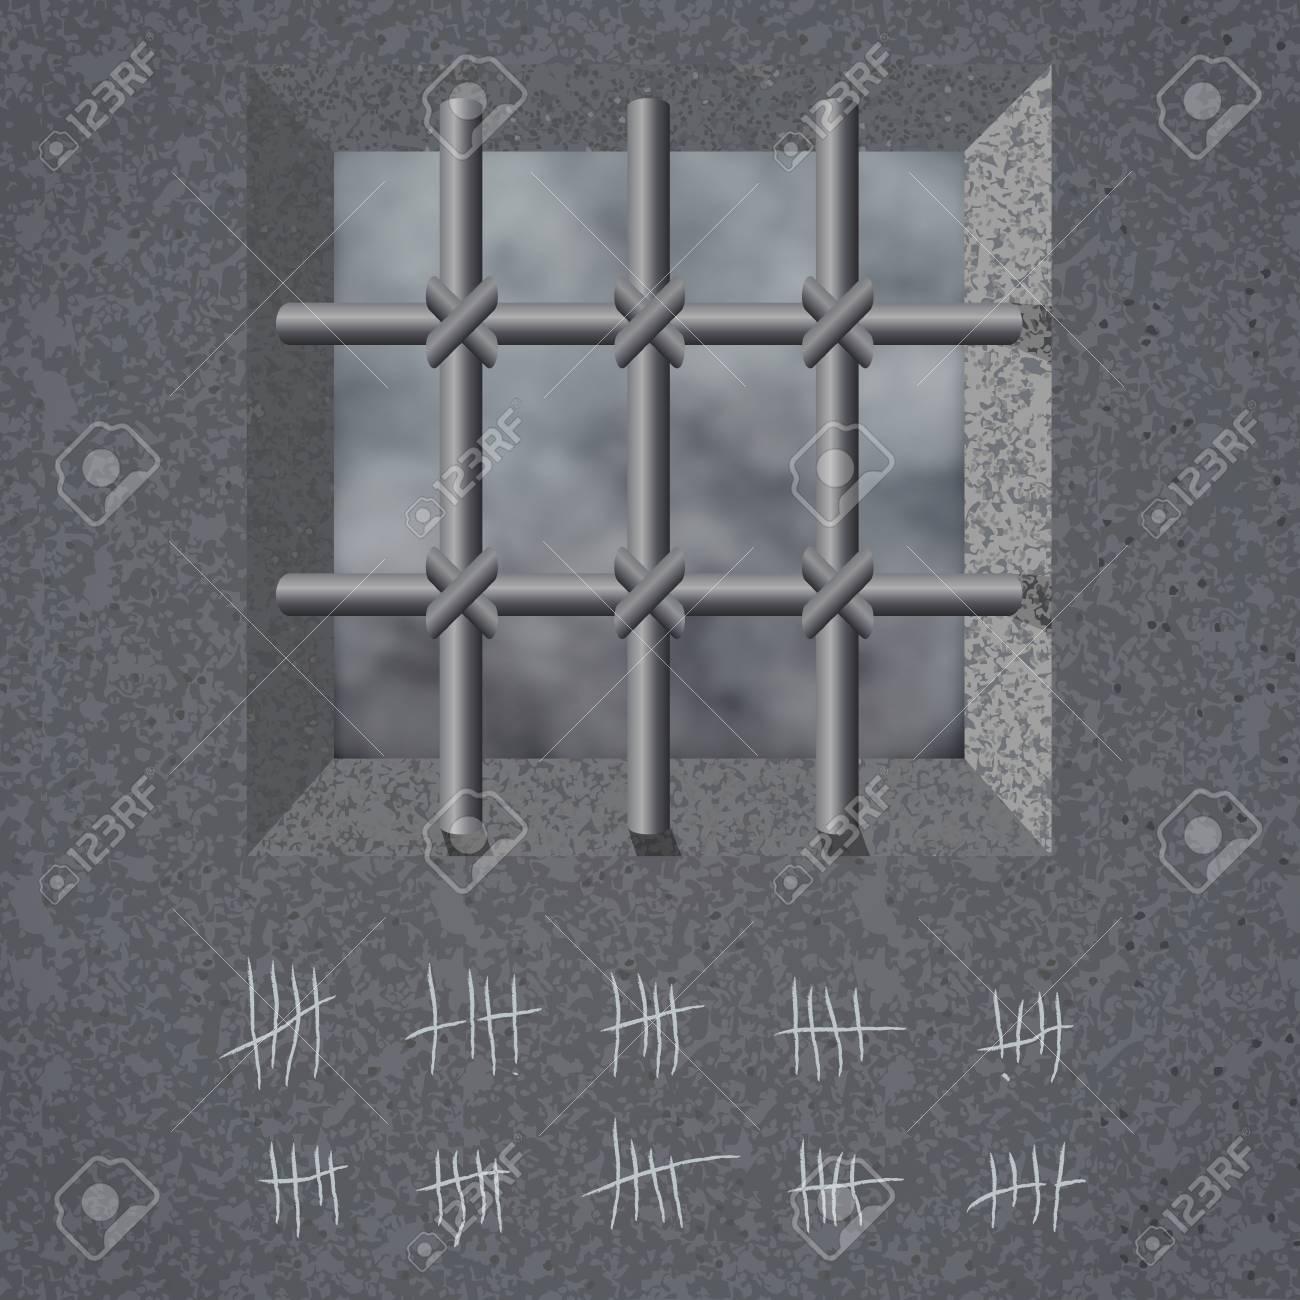 Prison Background Vector Illustration Eps10 Royalty 1300x1300